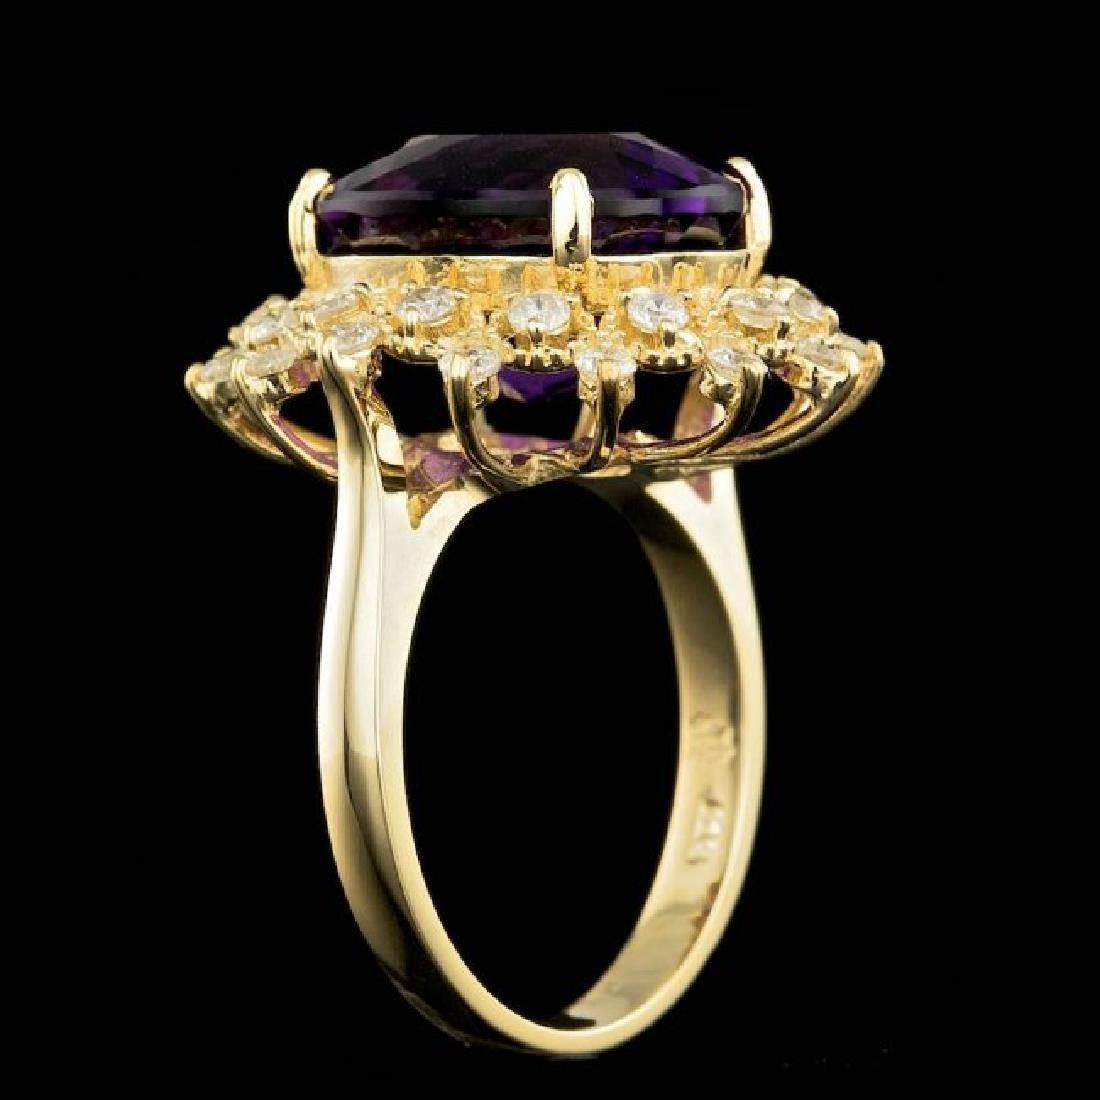 14k Gold 8.00ct Amethyst 0.80ct Diamond Ring - 5